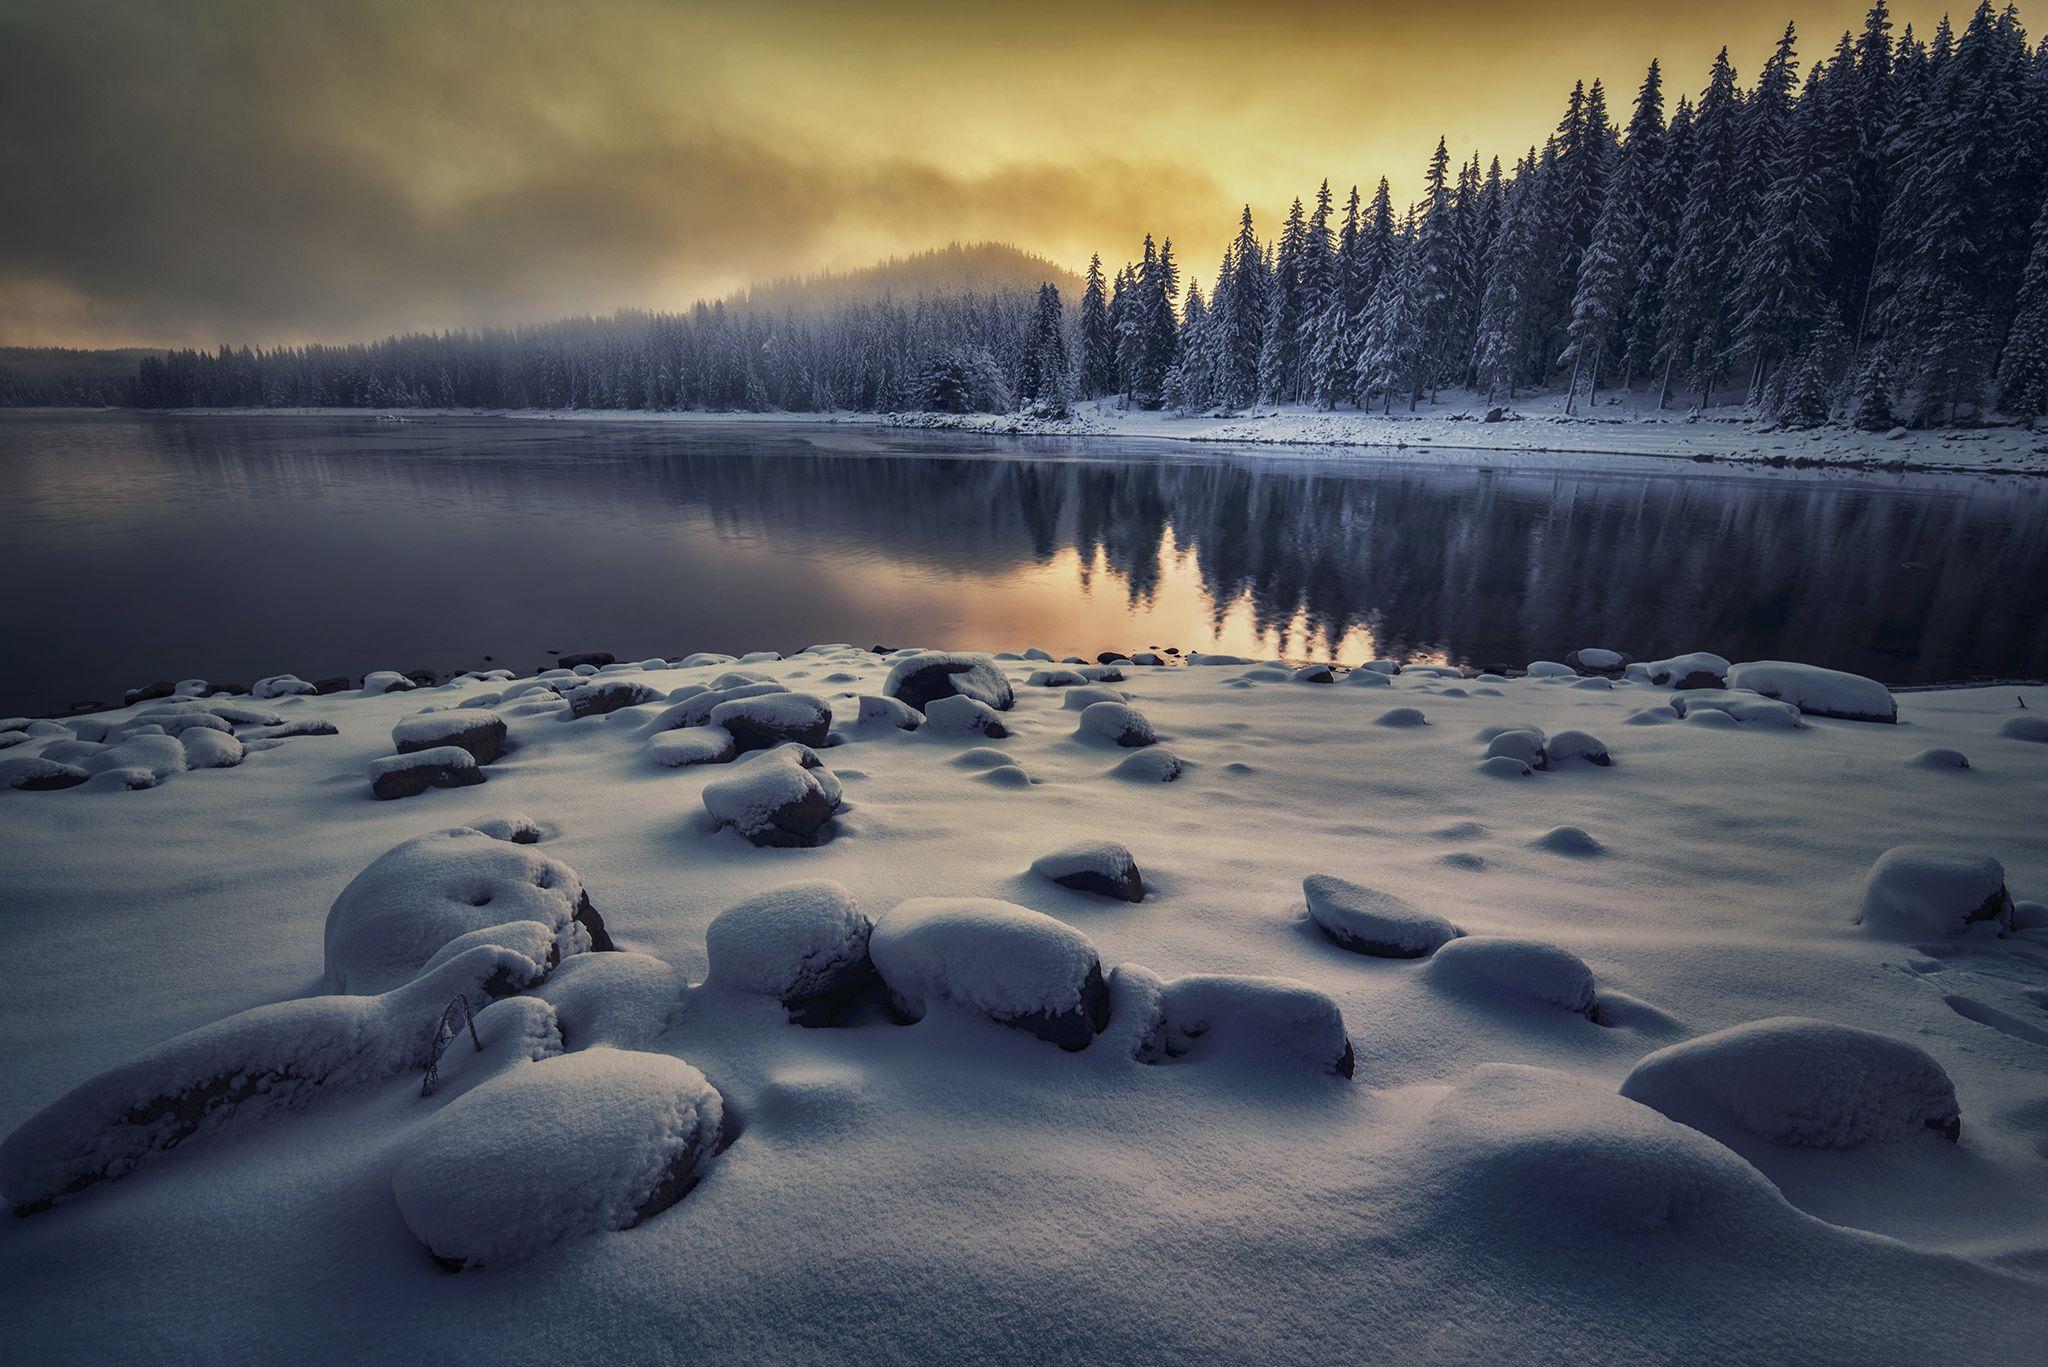 The First Snow Pejzazh Priroda Landscape Nature Snow Sunrise Pejzazh Priroda Landscape Nature Snow Sunrise Photographer Genad Nature Photography Landscape Photography Take Better Photos